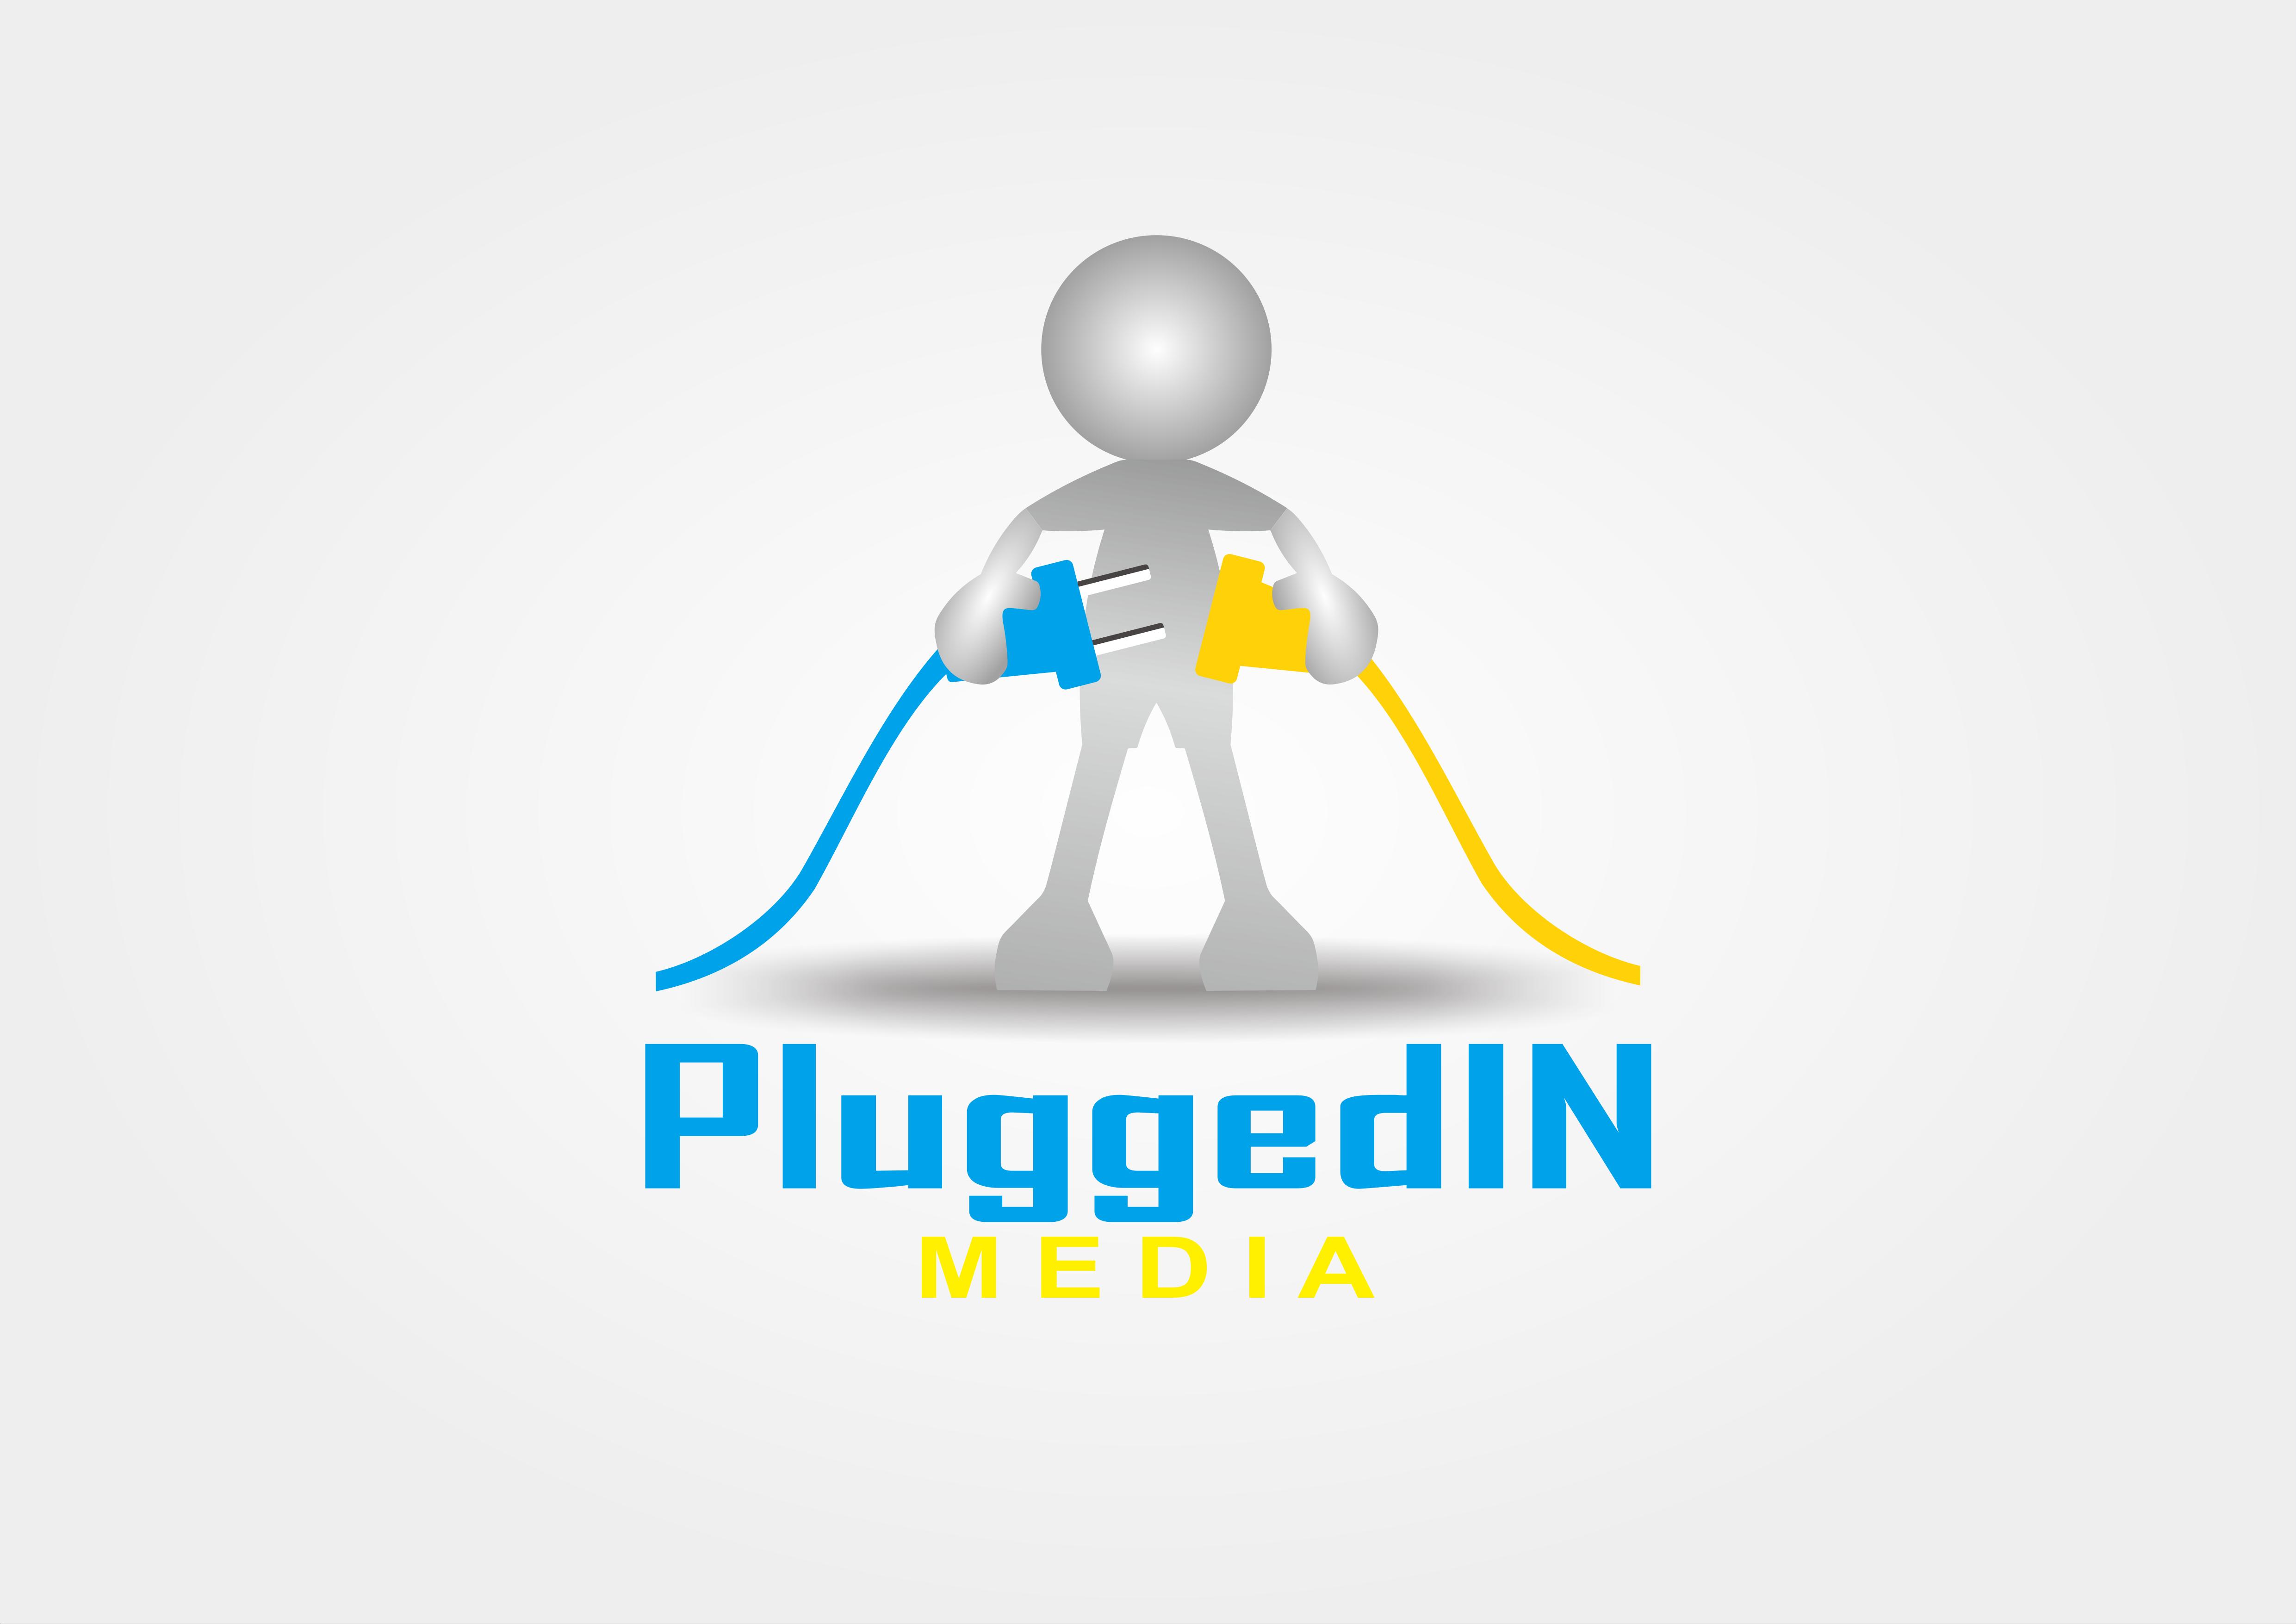 Project_2_Pluggedin_Media